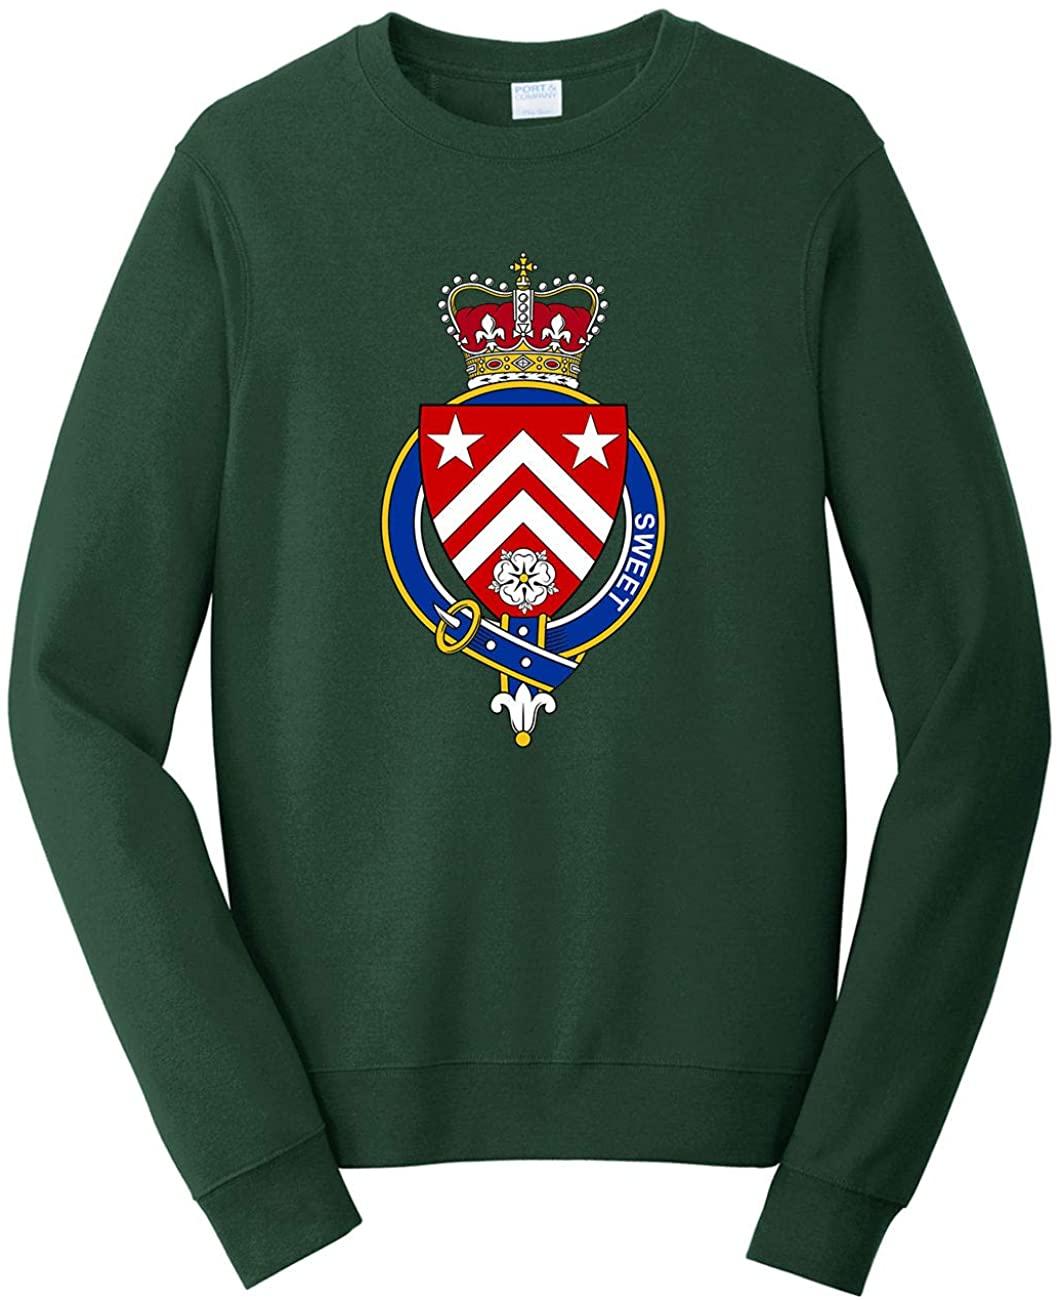 HARD EDGE DESIGN Men's English Garter Family Sweet Sweatshirt, Large, Forest Green